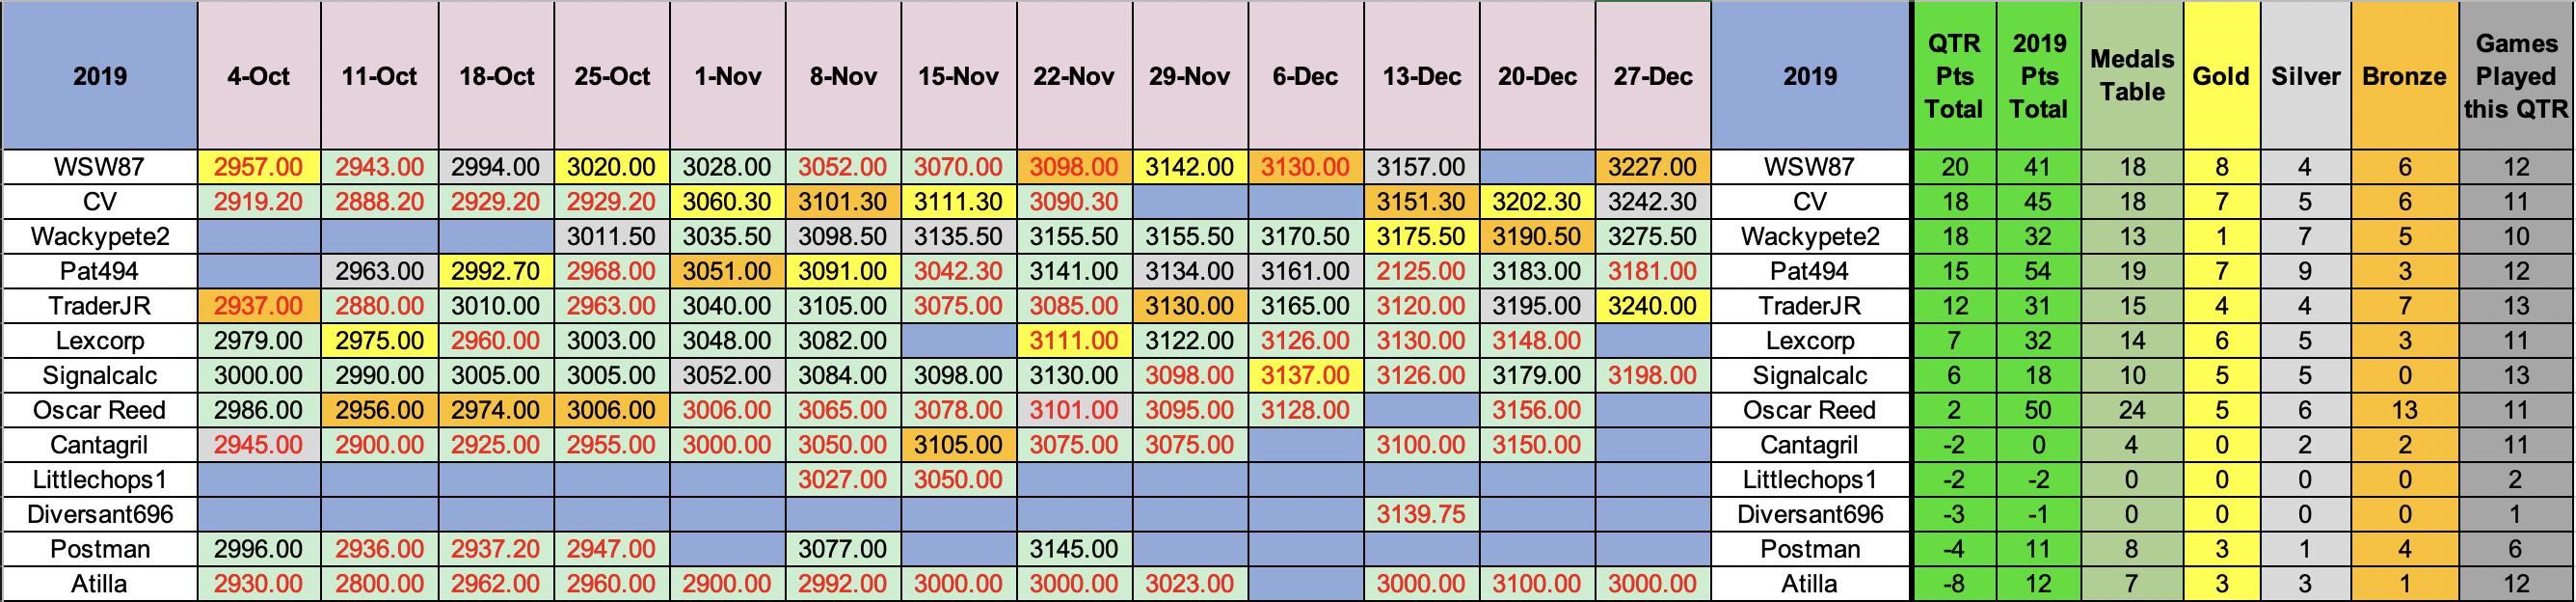 SP500 quarterly results Dec 19.png